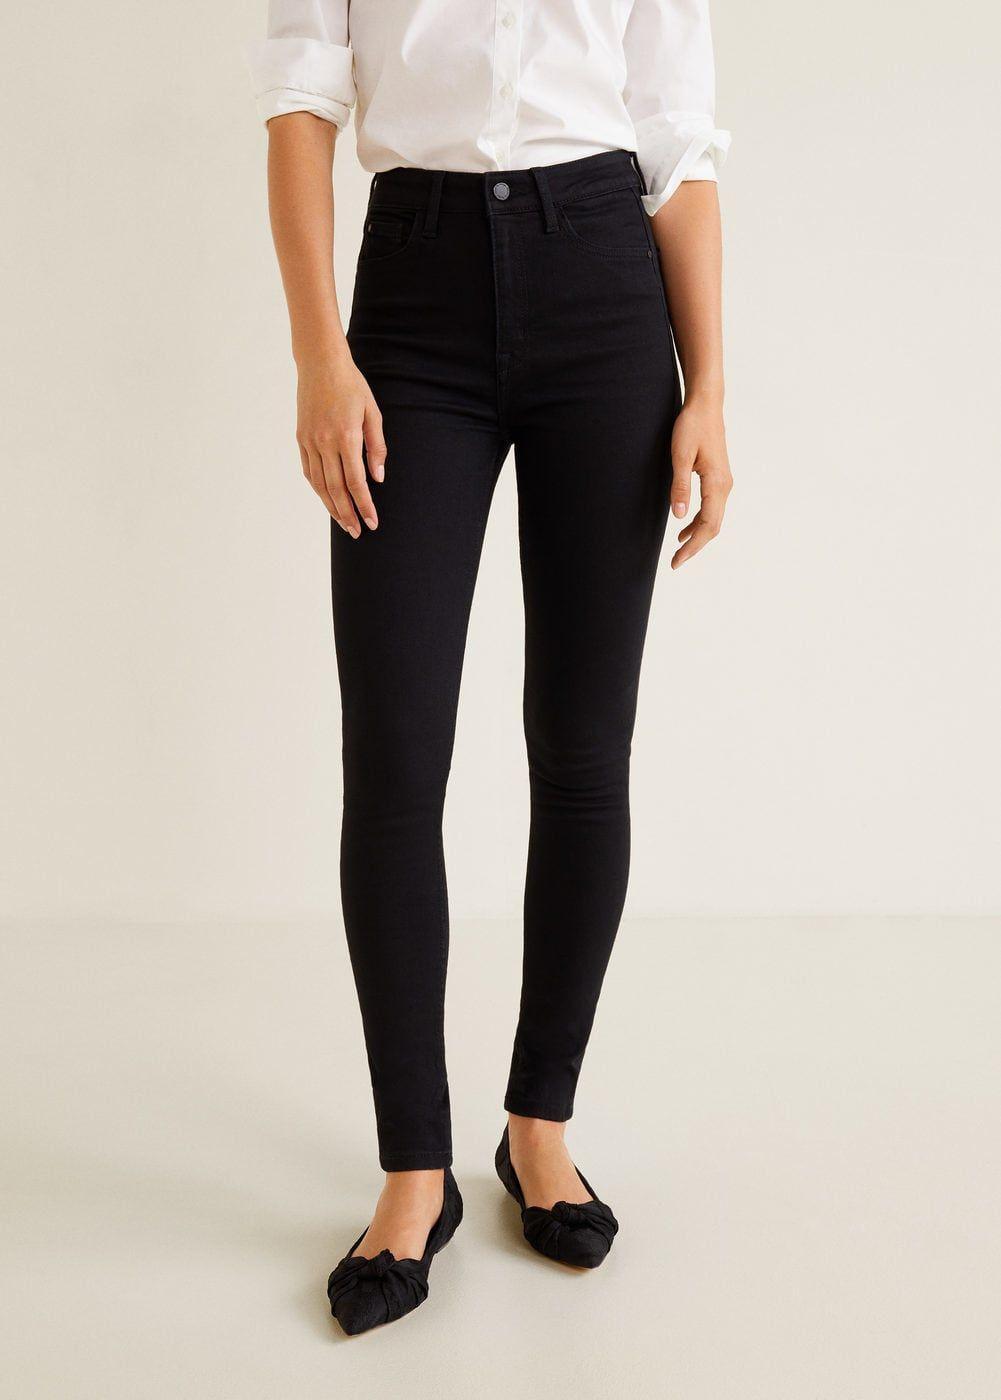 Ladies Mango Jeans High Waist Skinny Colour Jeggings Womens Denim Blue Jean